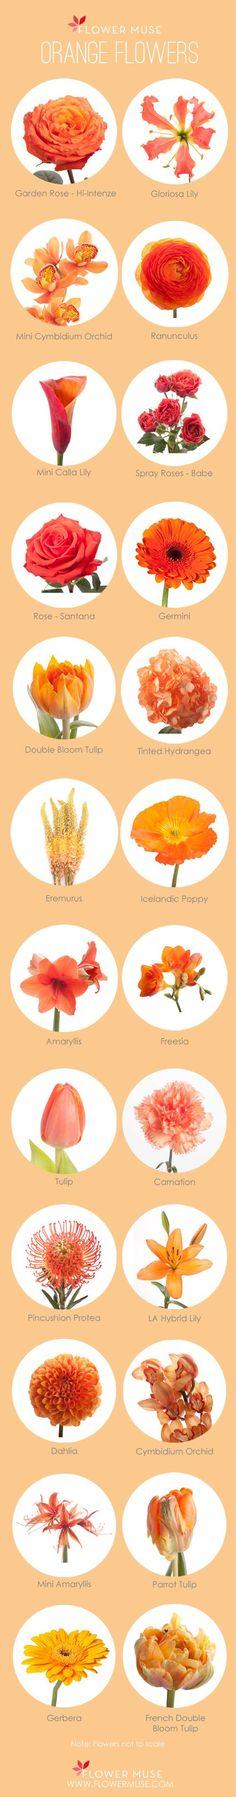 Our Favorite: Orange Flowers - more on Flower Muse blog